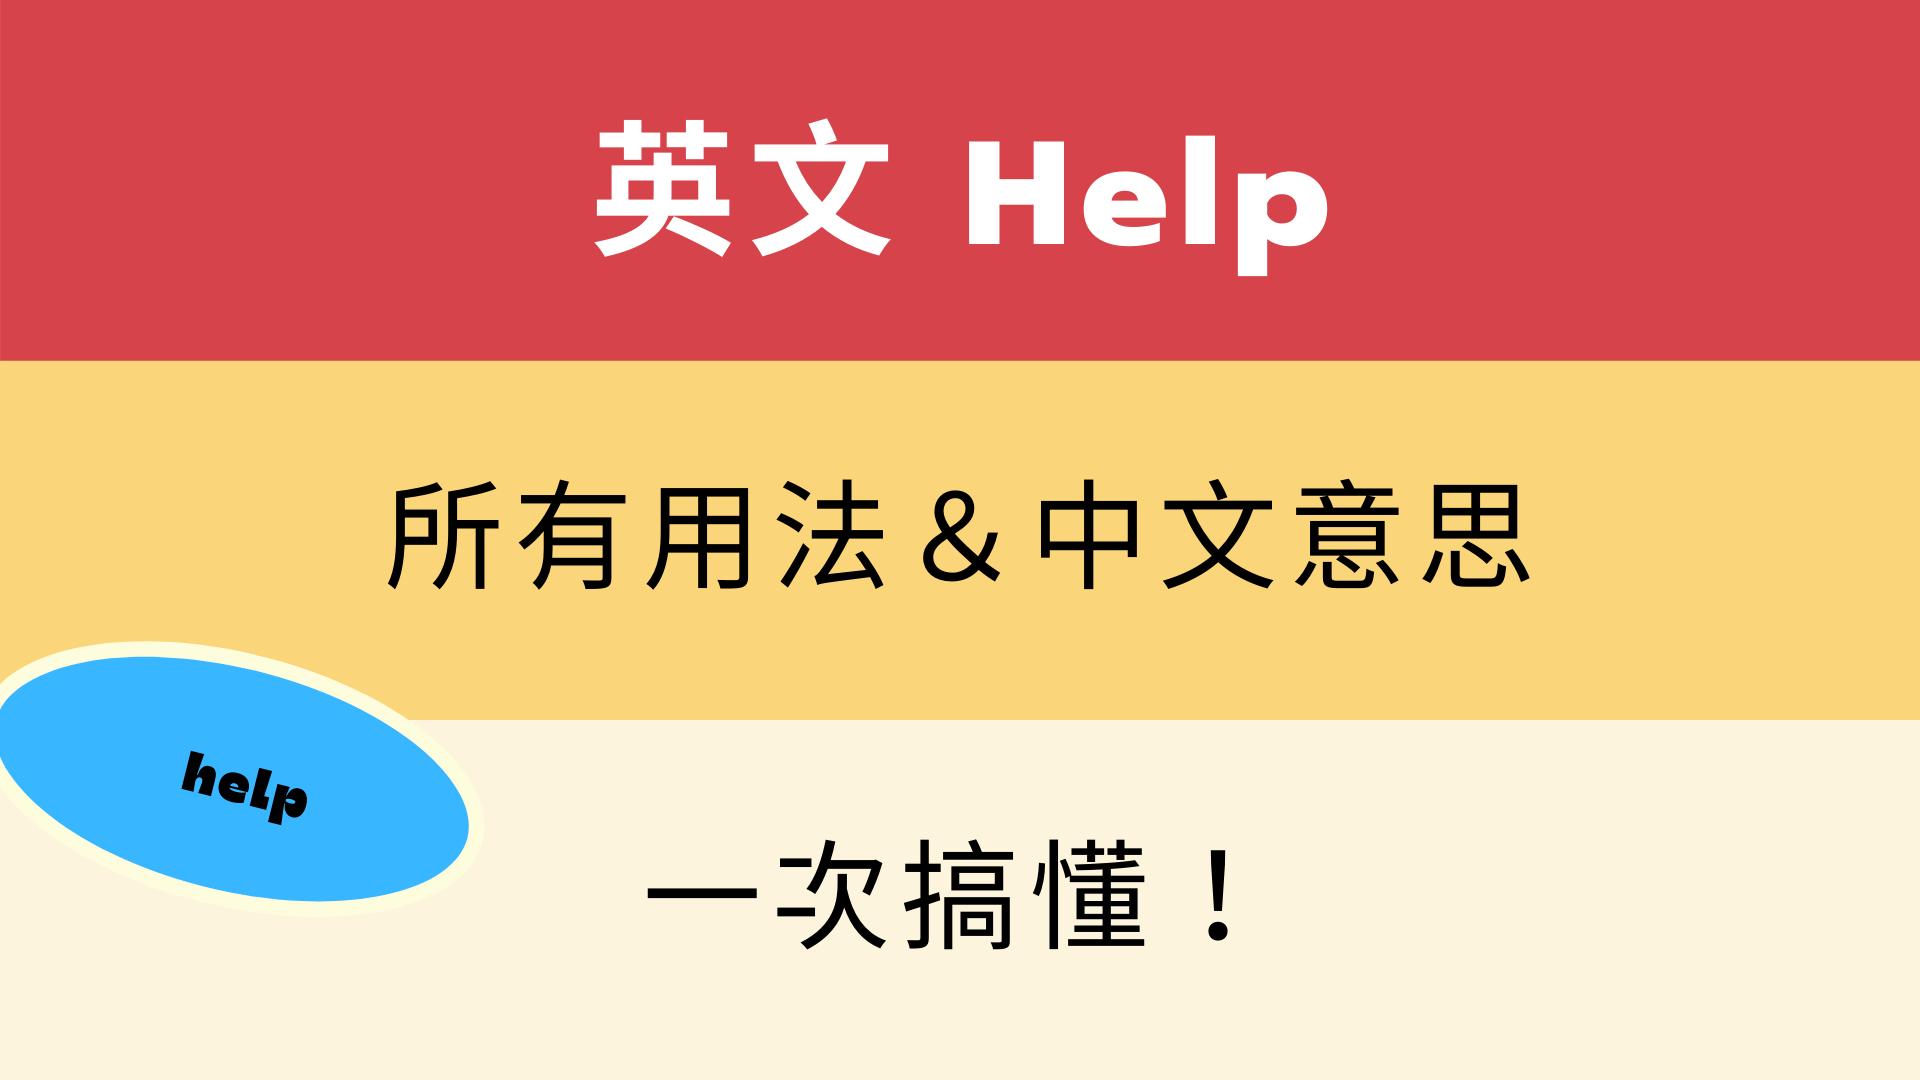 【help 用法】一次搞懂英文「help」用法跟中文意思